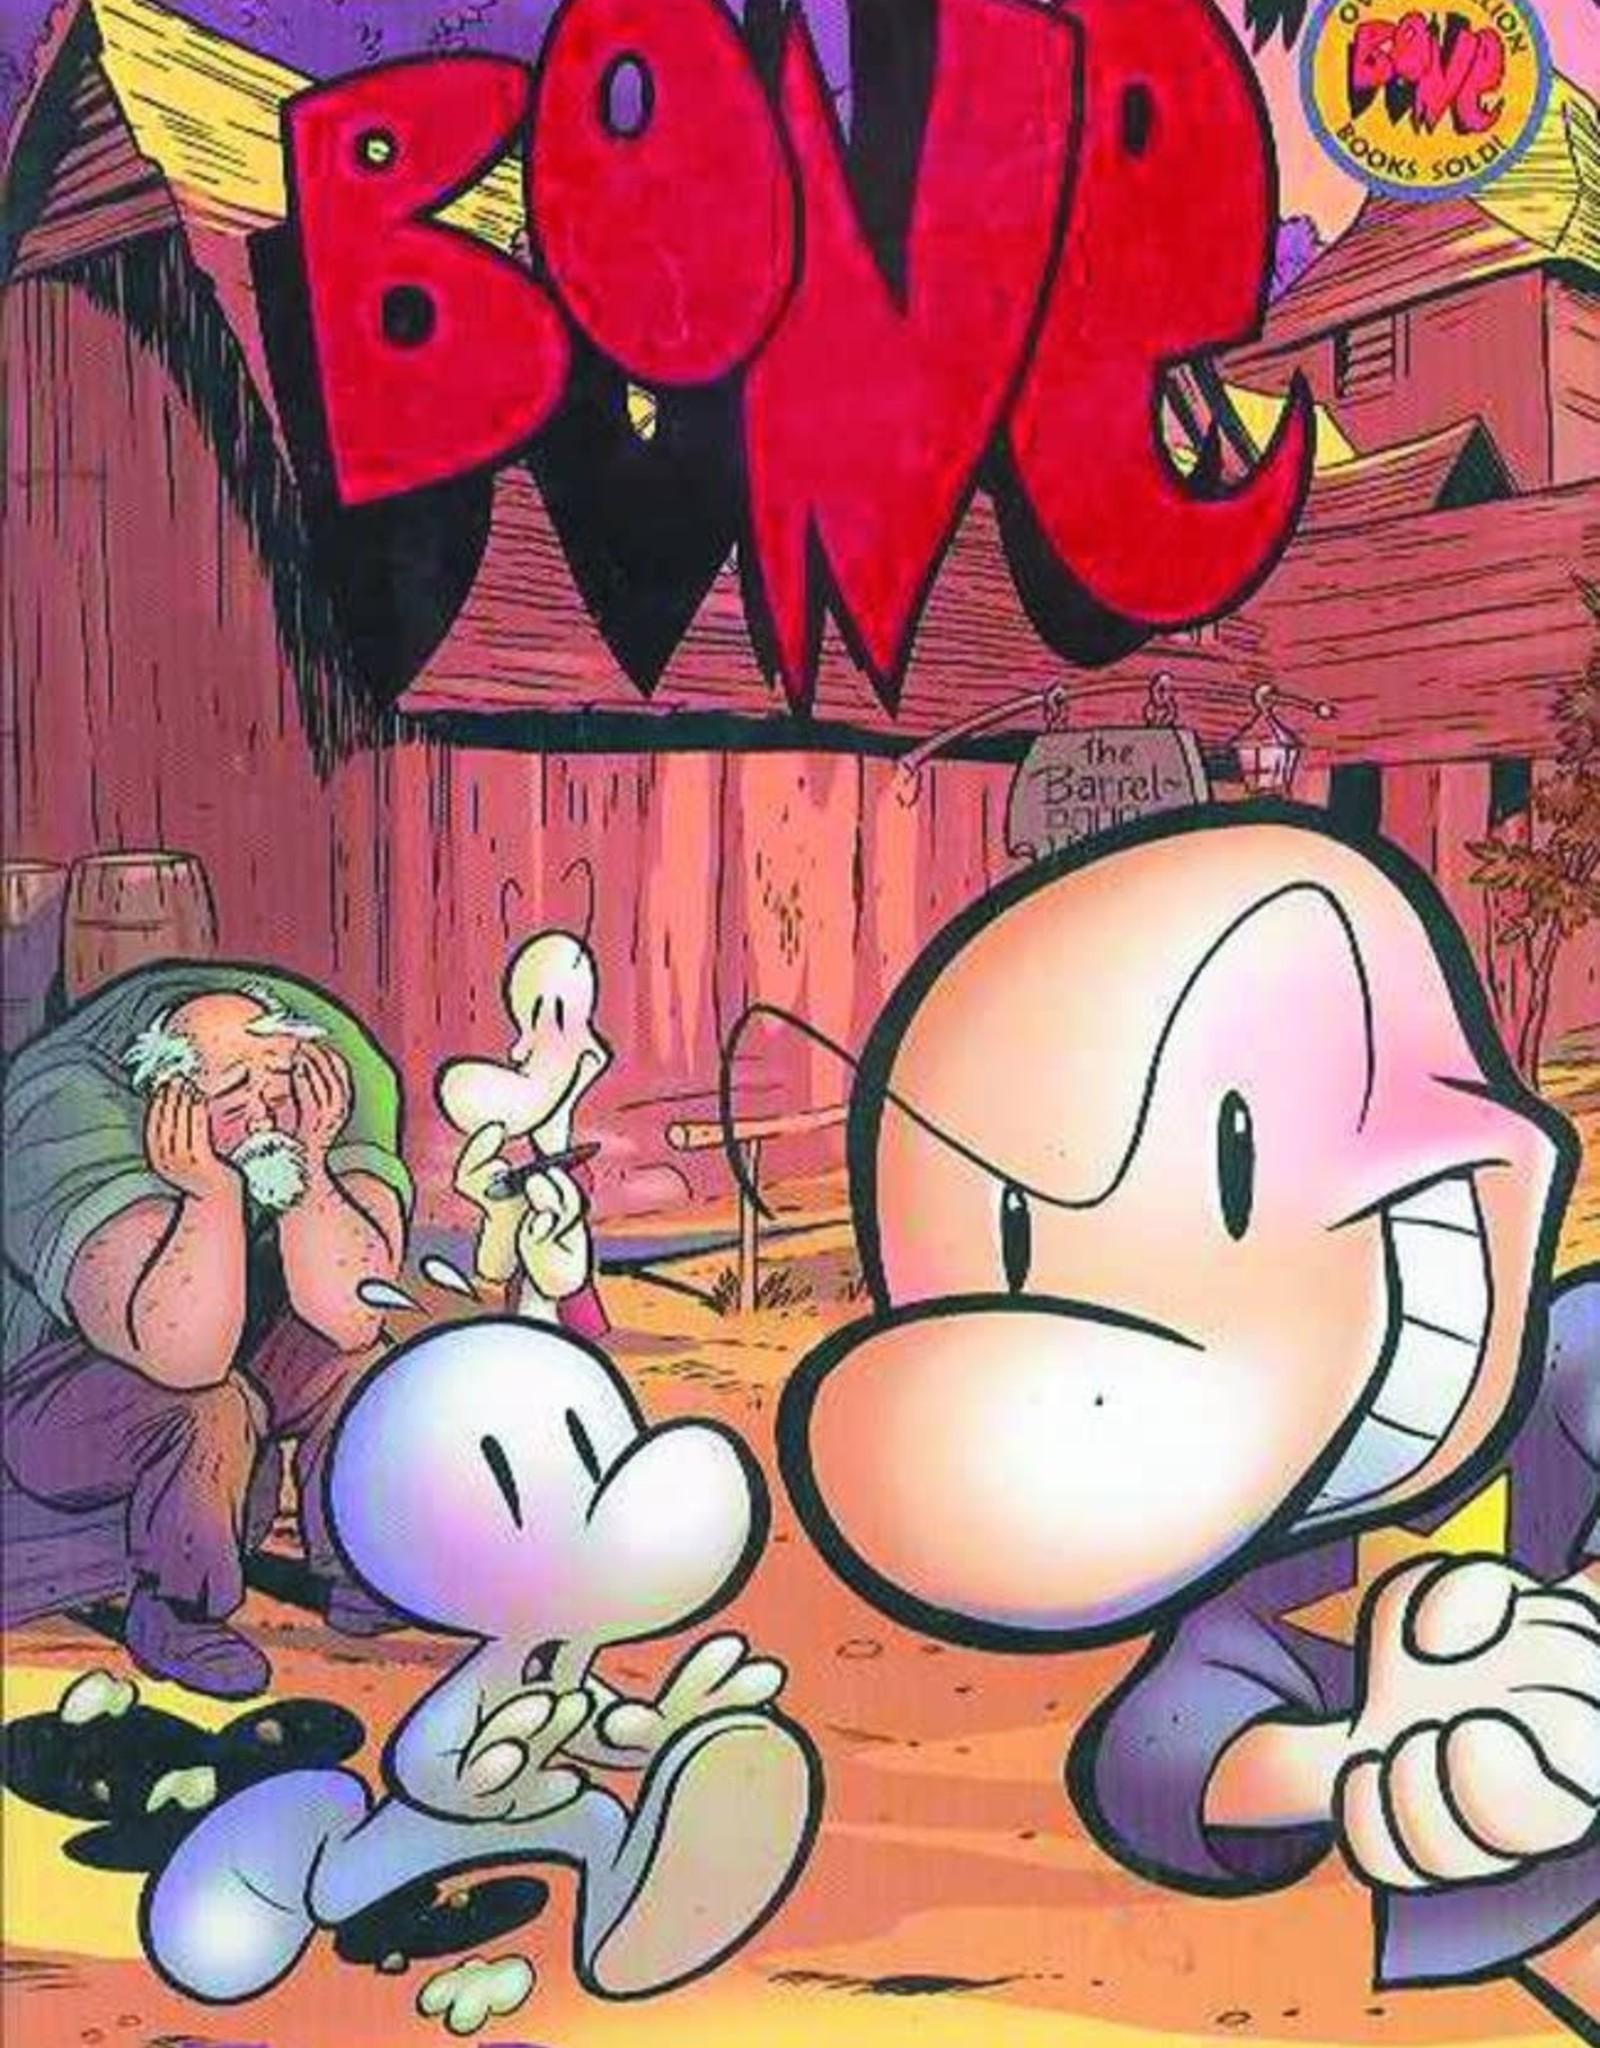 Graphix Bone Vol 04: The Dragonslayer TP